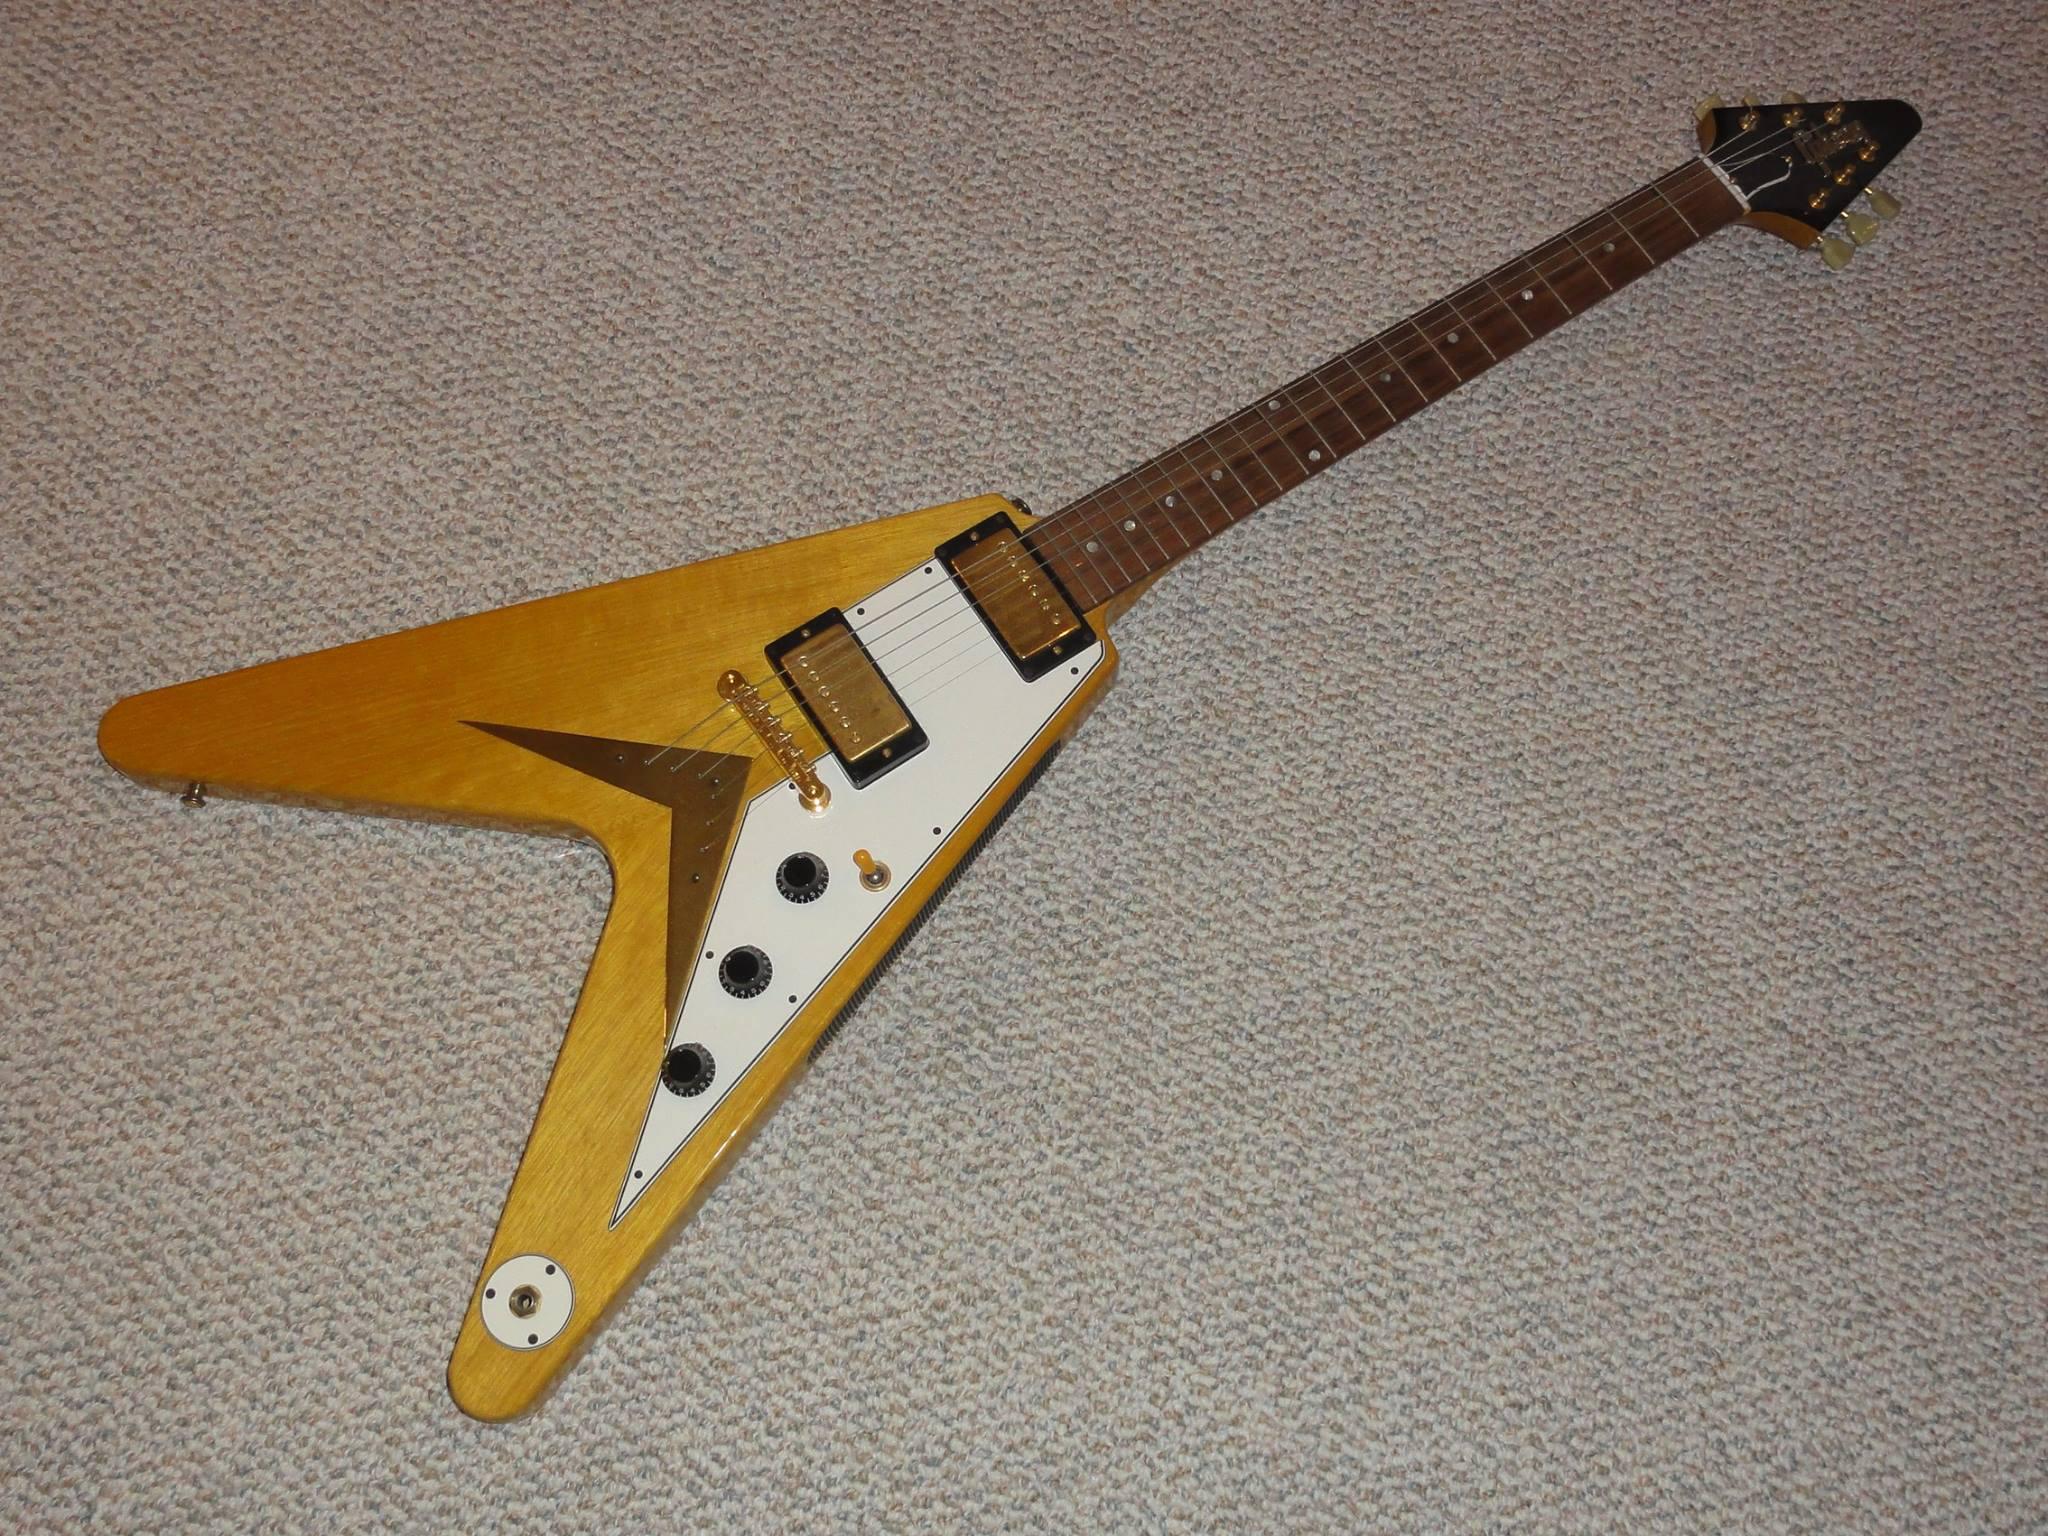 Buy Old Guitar Chicago